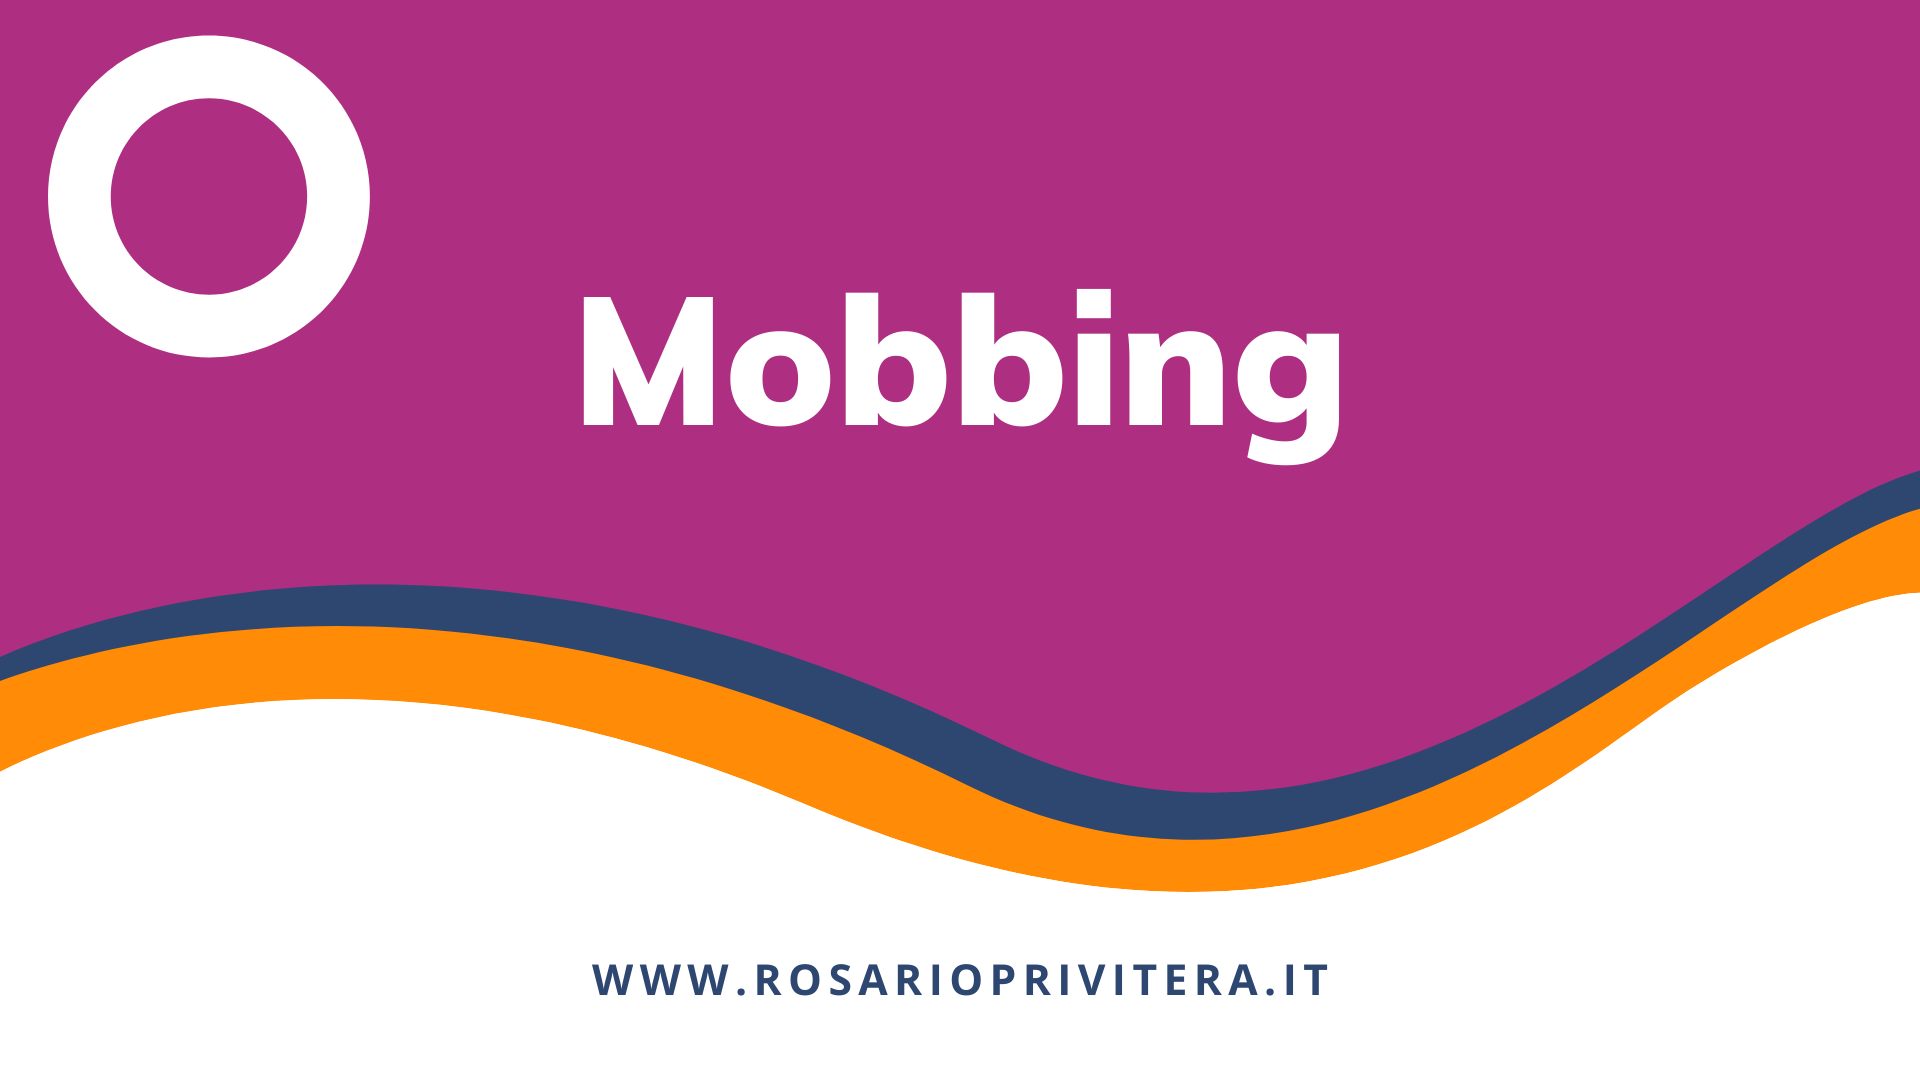 Mobbing_Rosario Privitera, psicologo LGBT a Milano e online